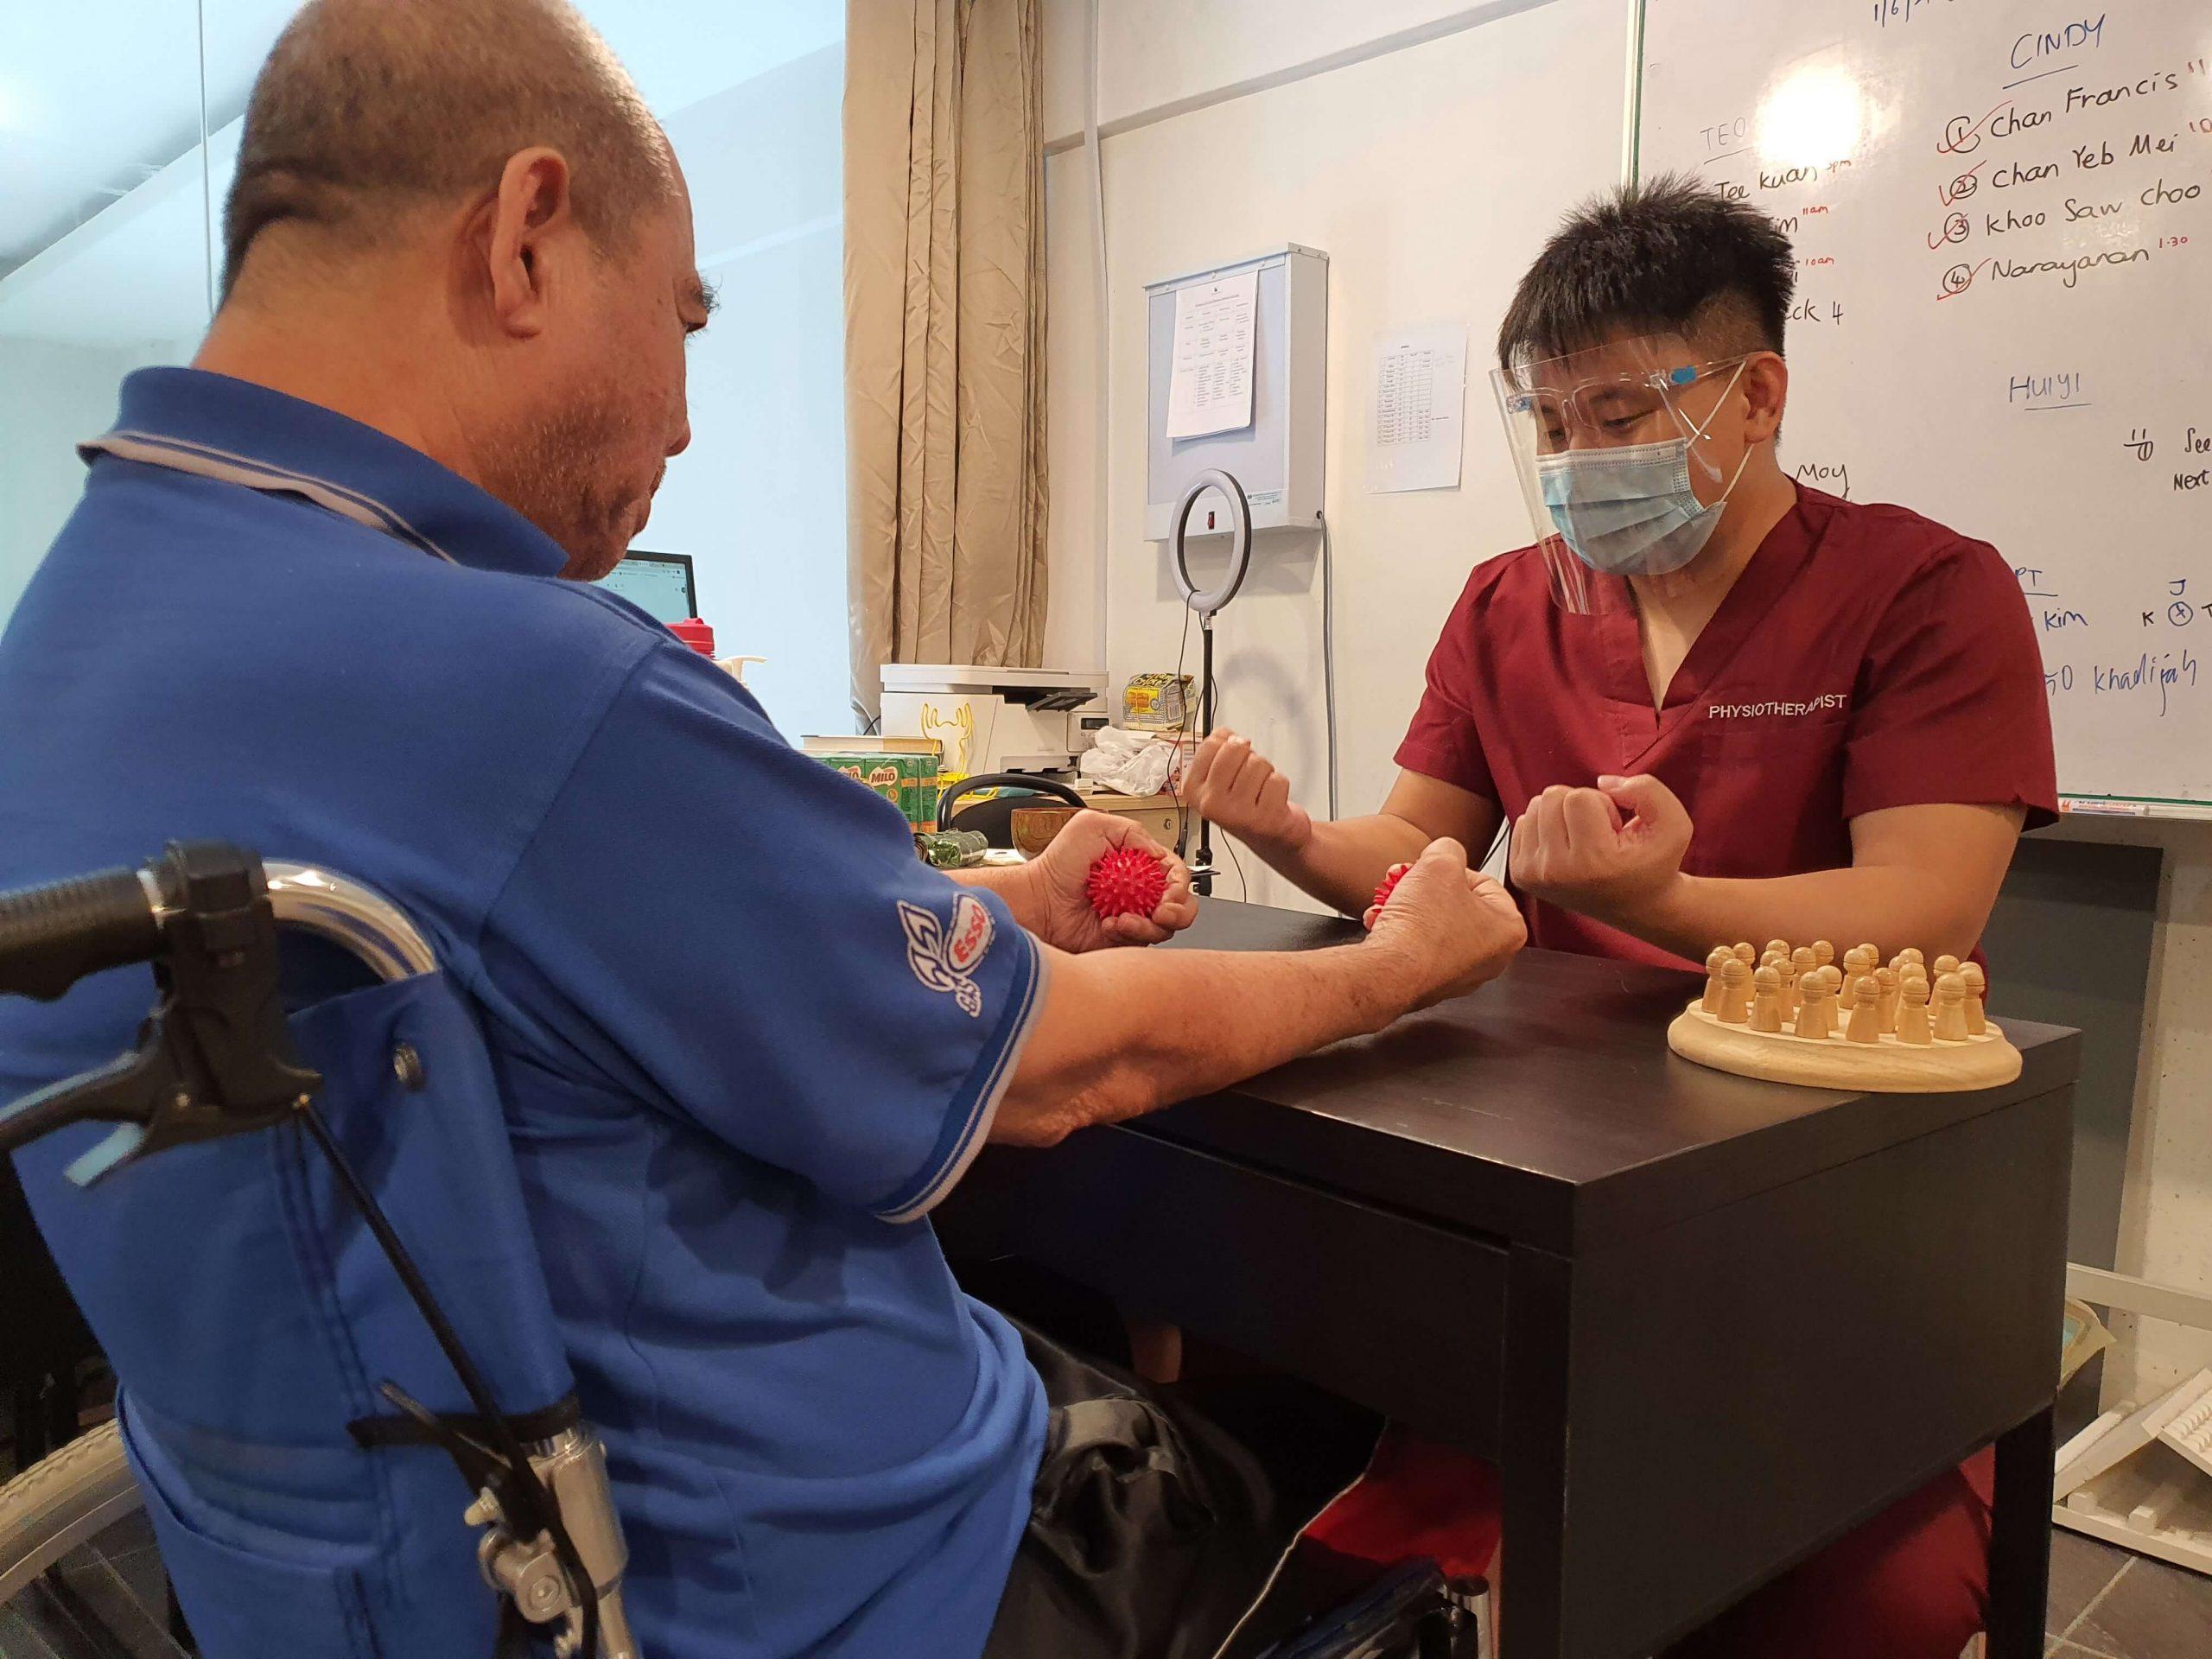 Physio rehab session